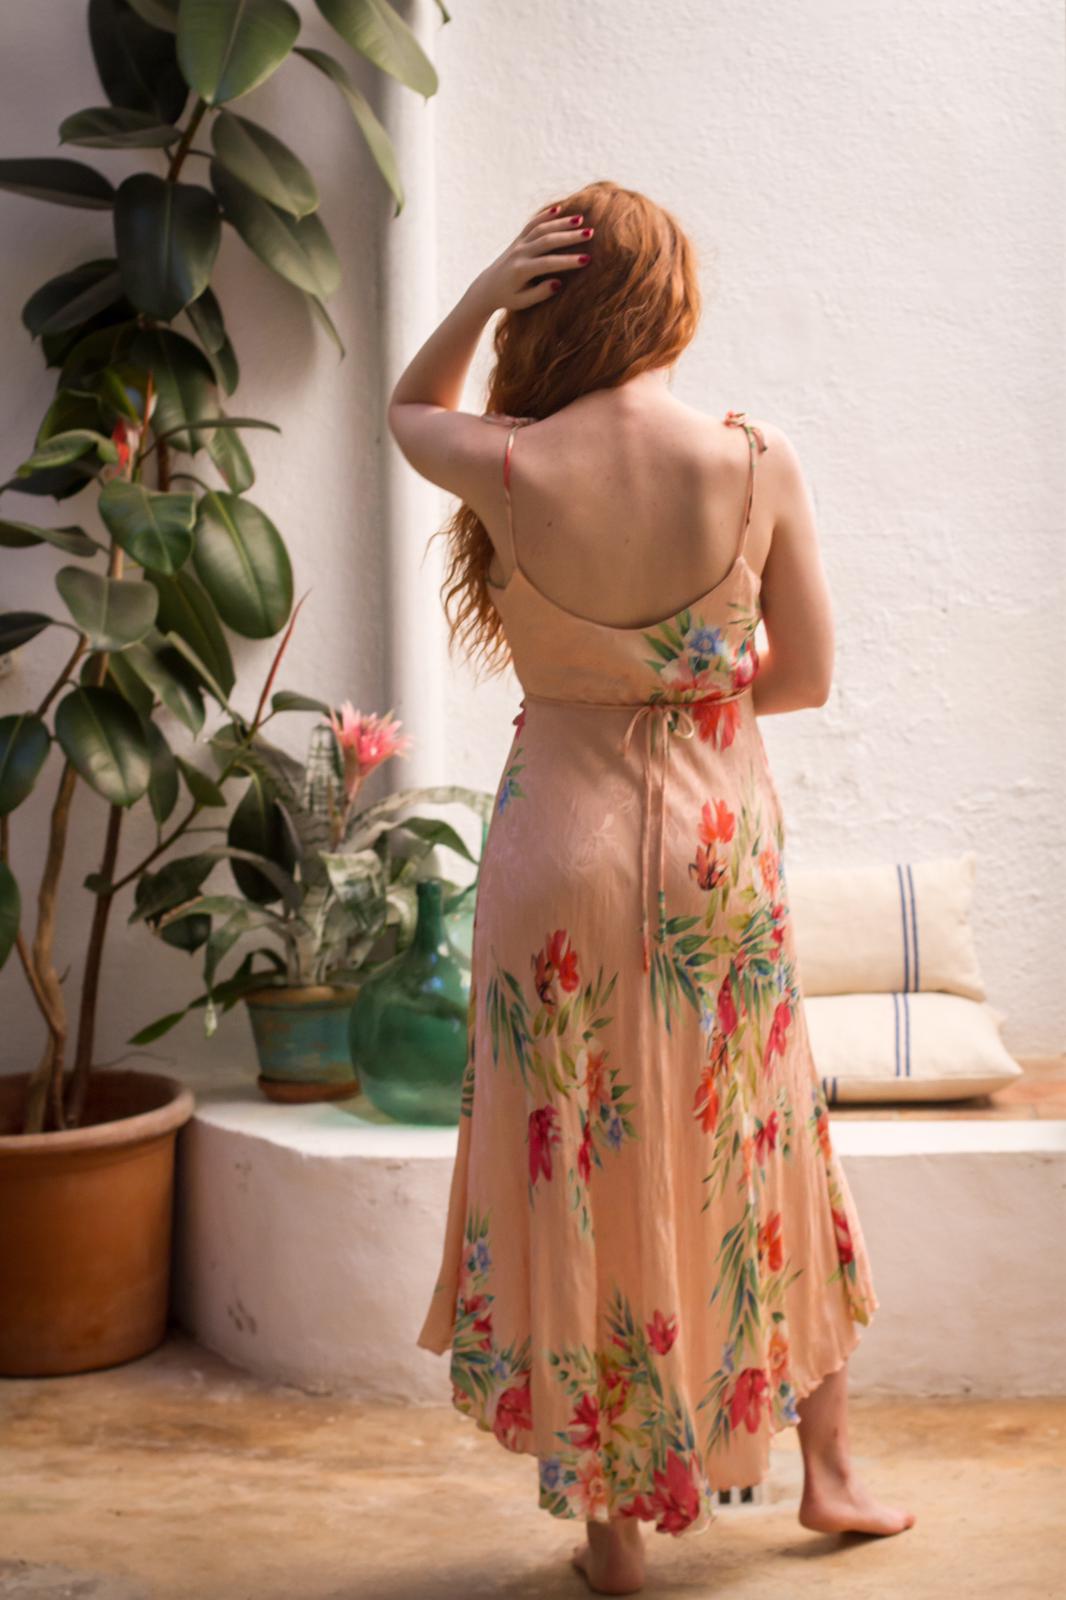 carolina.albertoni.mallorca.handmade.dresses.soft.sensual.feminity.designer.nature